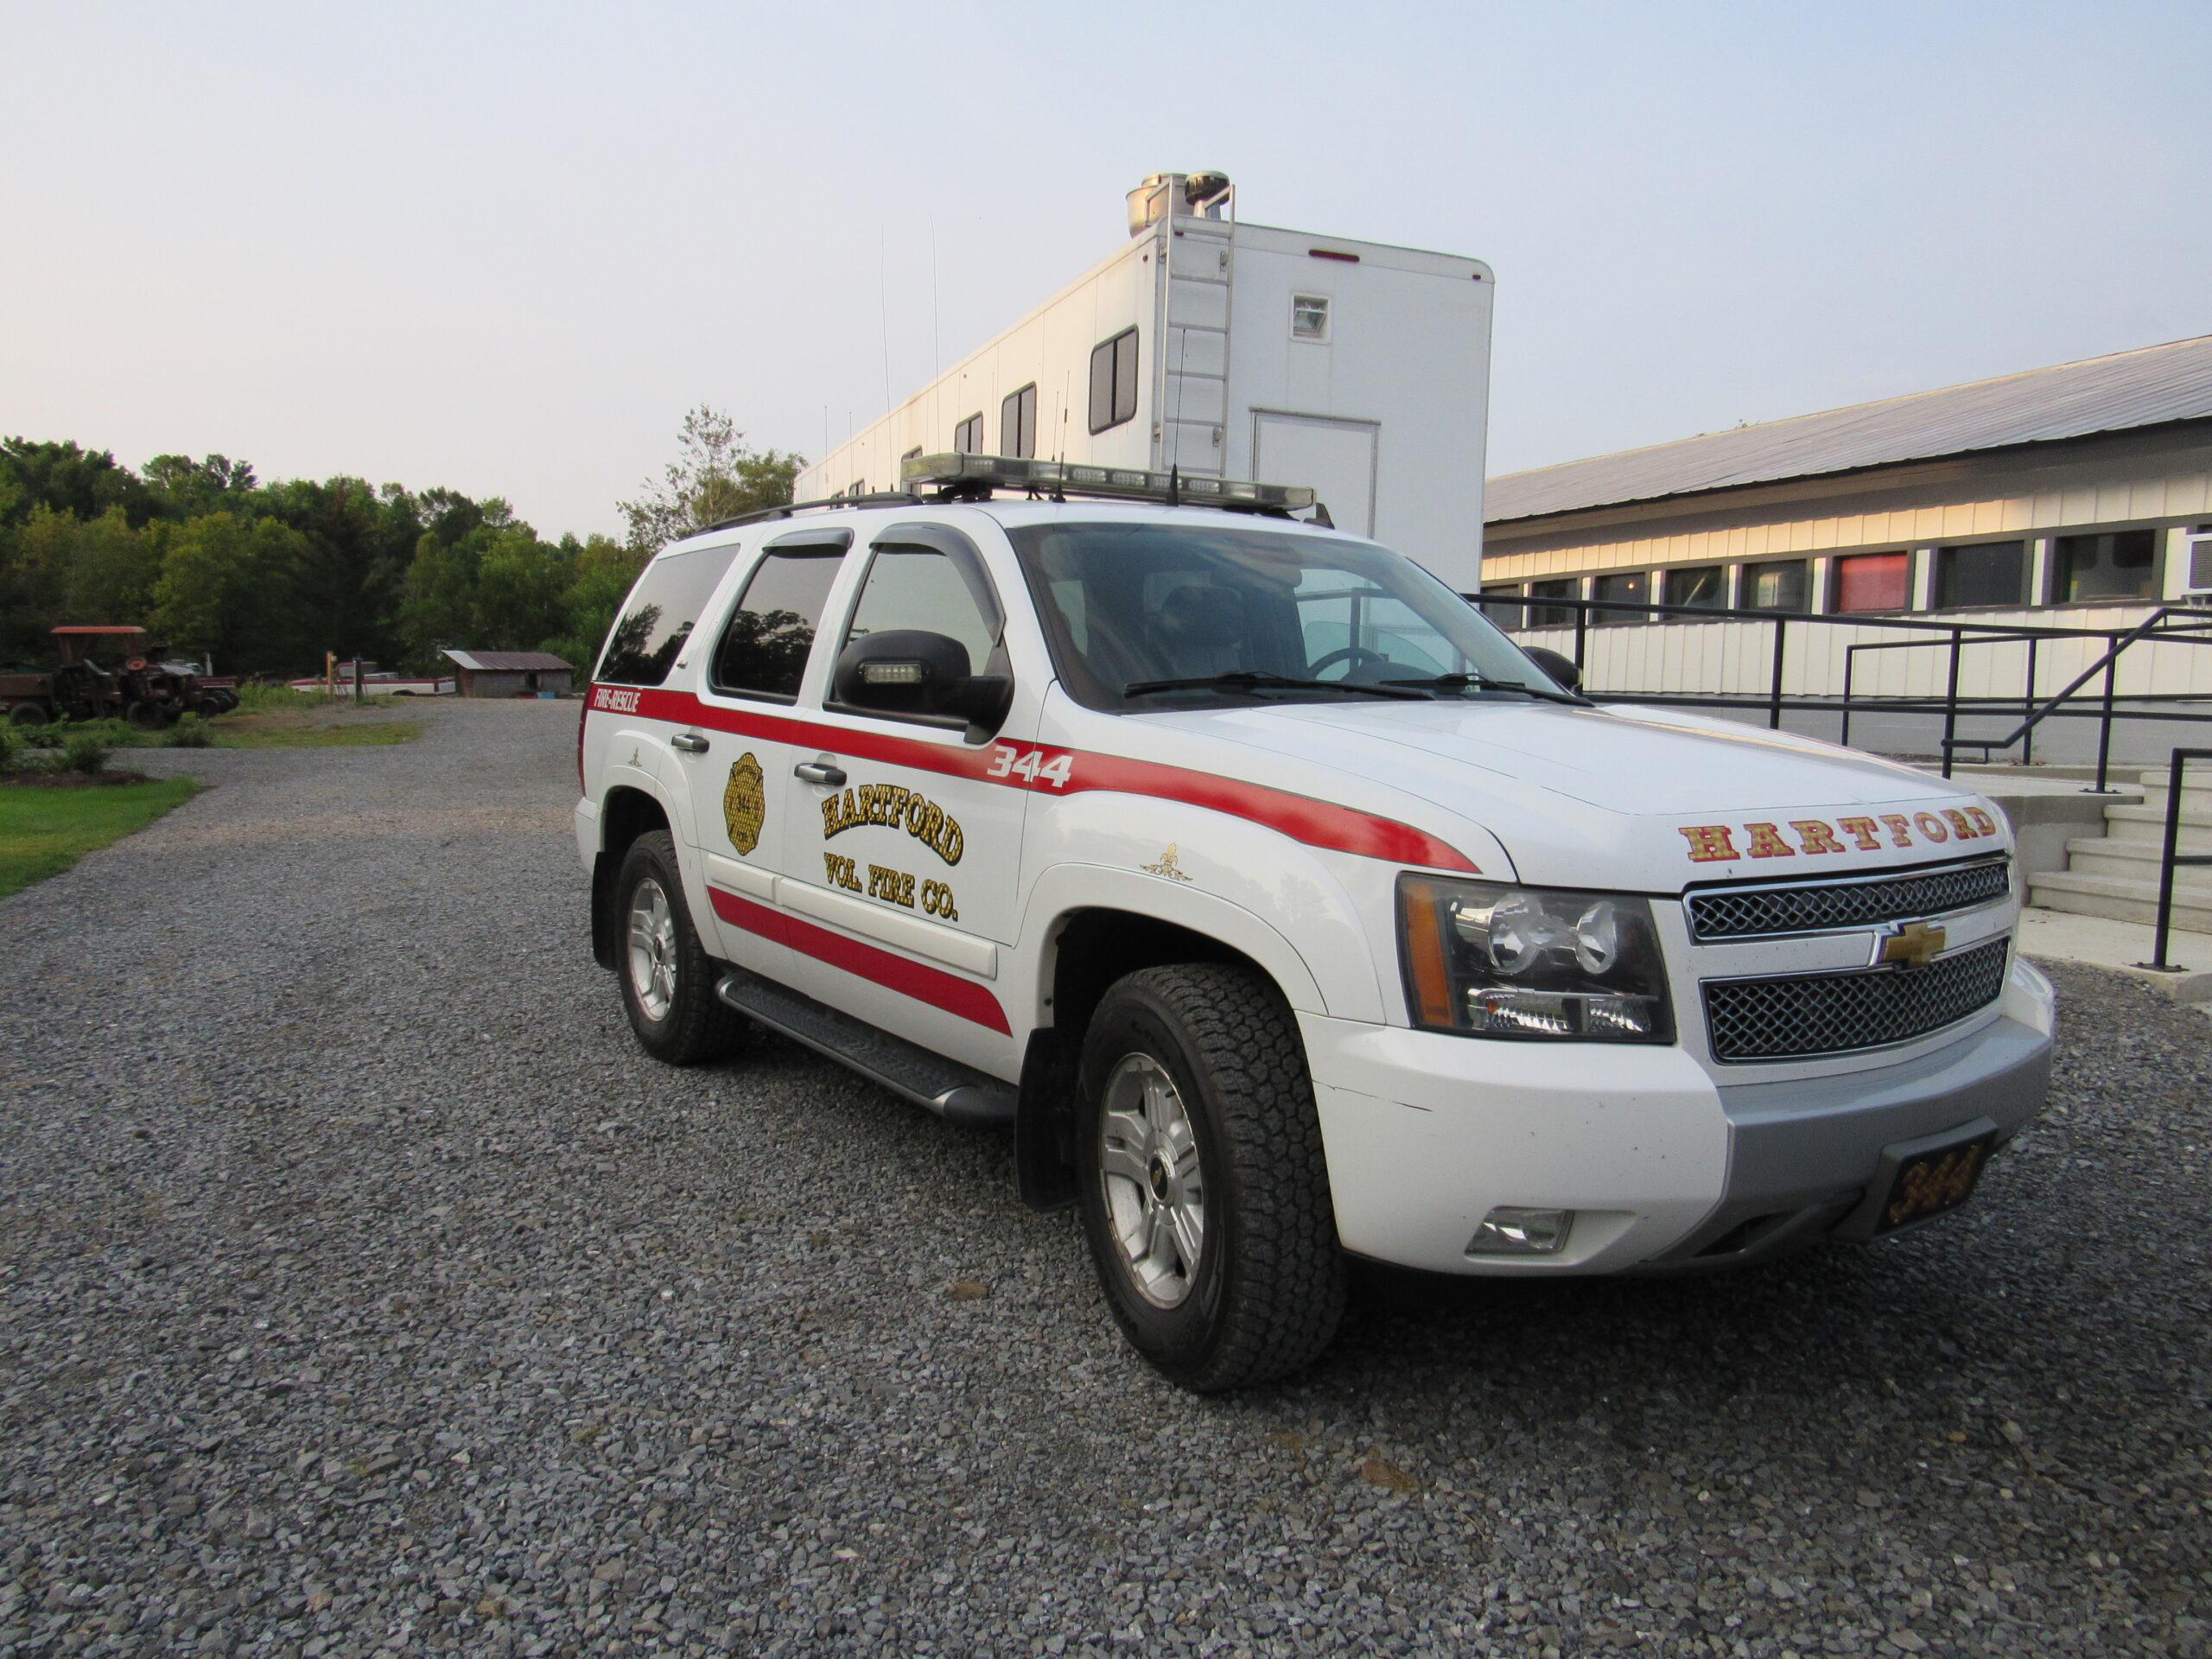 HVFC Tournament- Rescue Vehicle